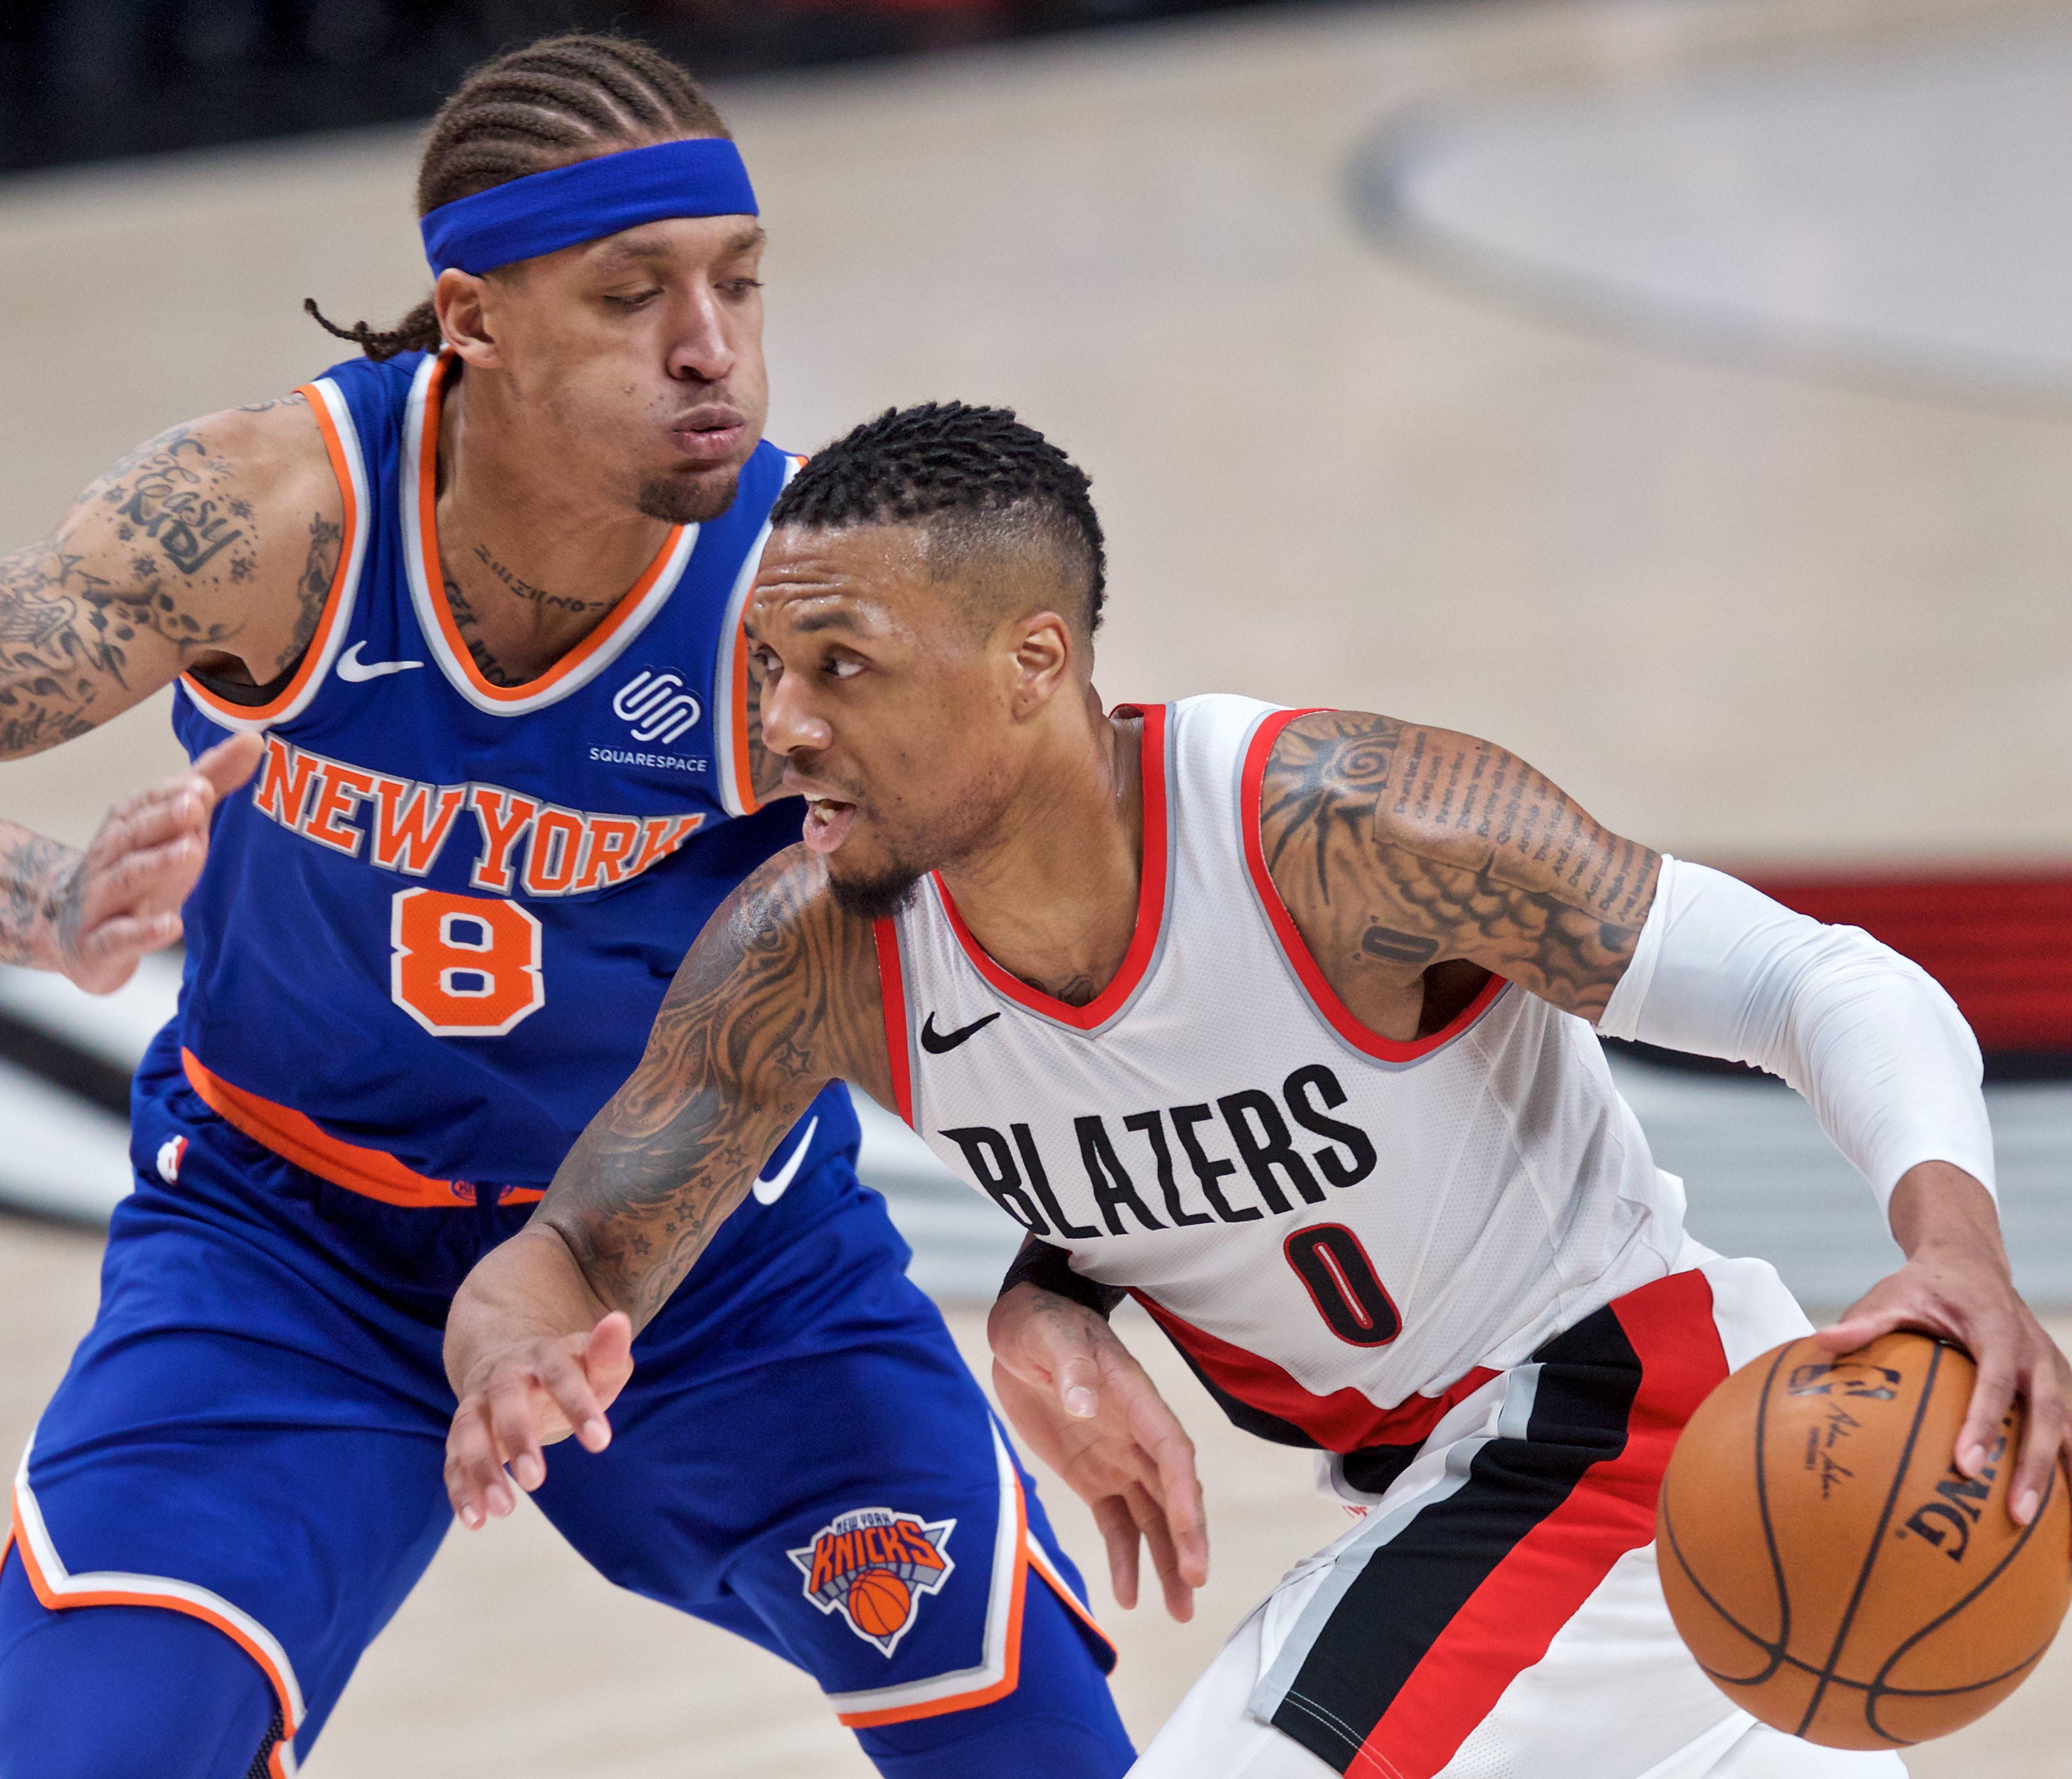 Damian Lillard pokes holes in Knicks' future hopes during latest loss